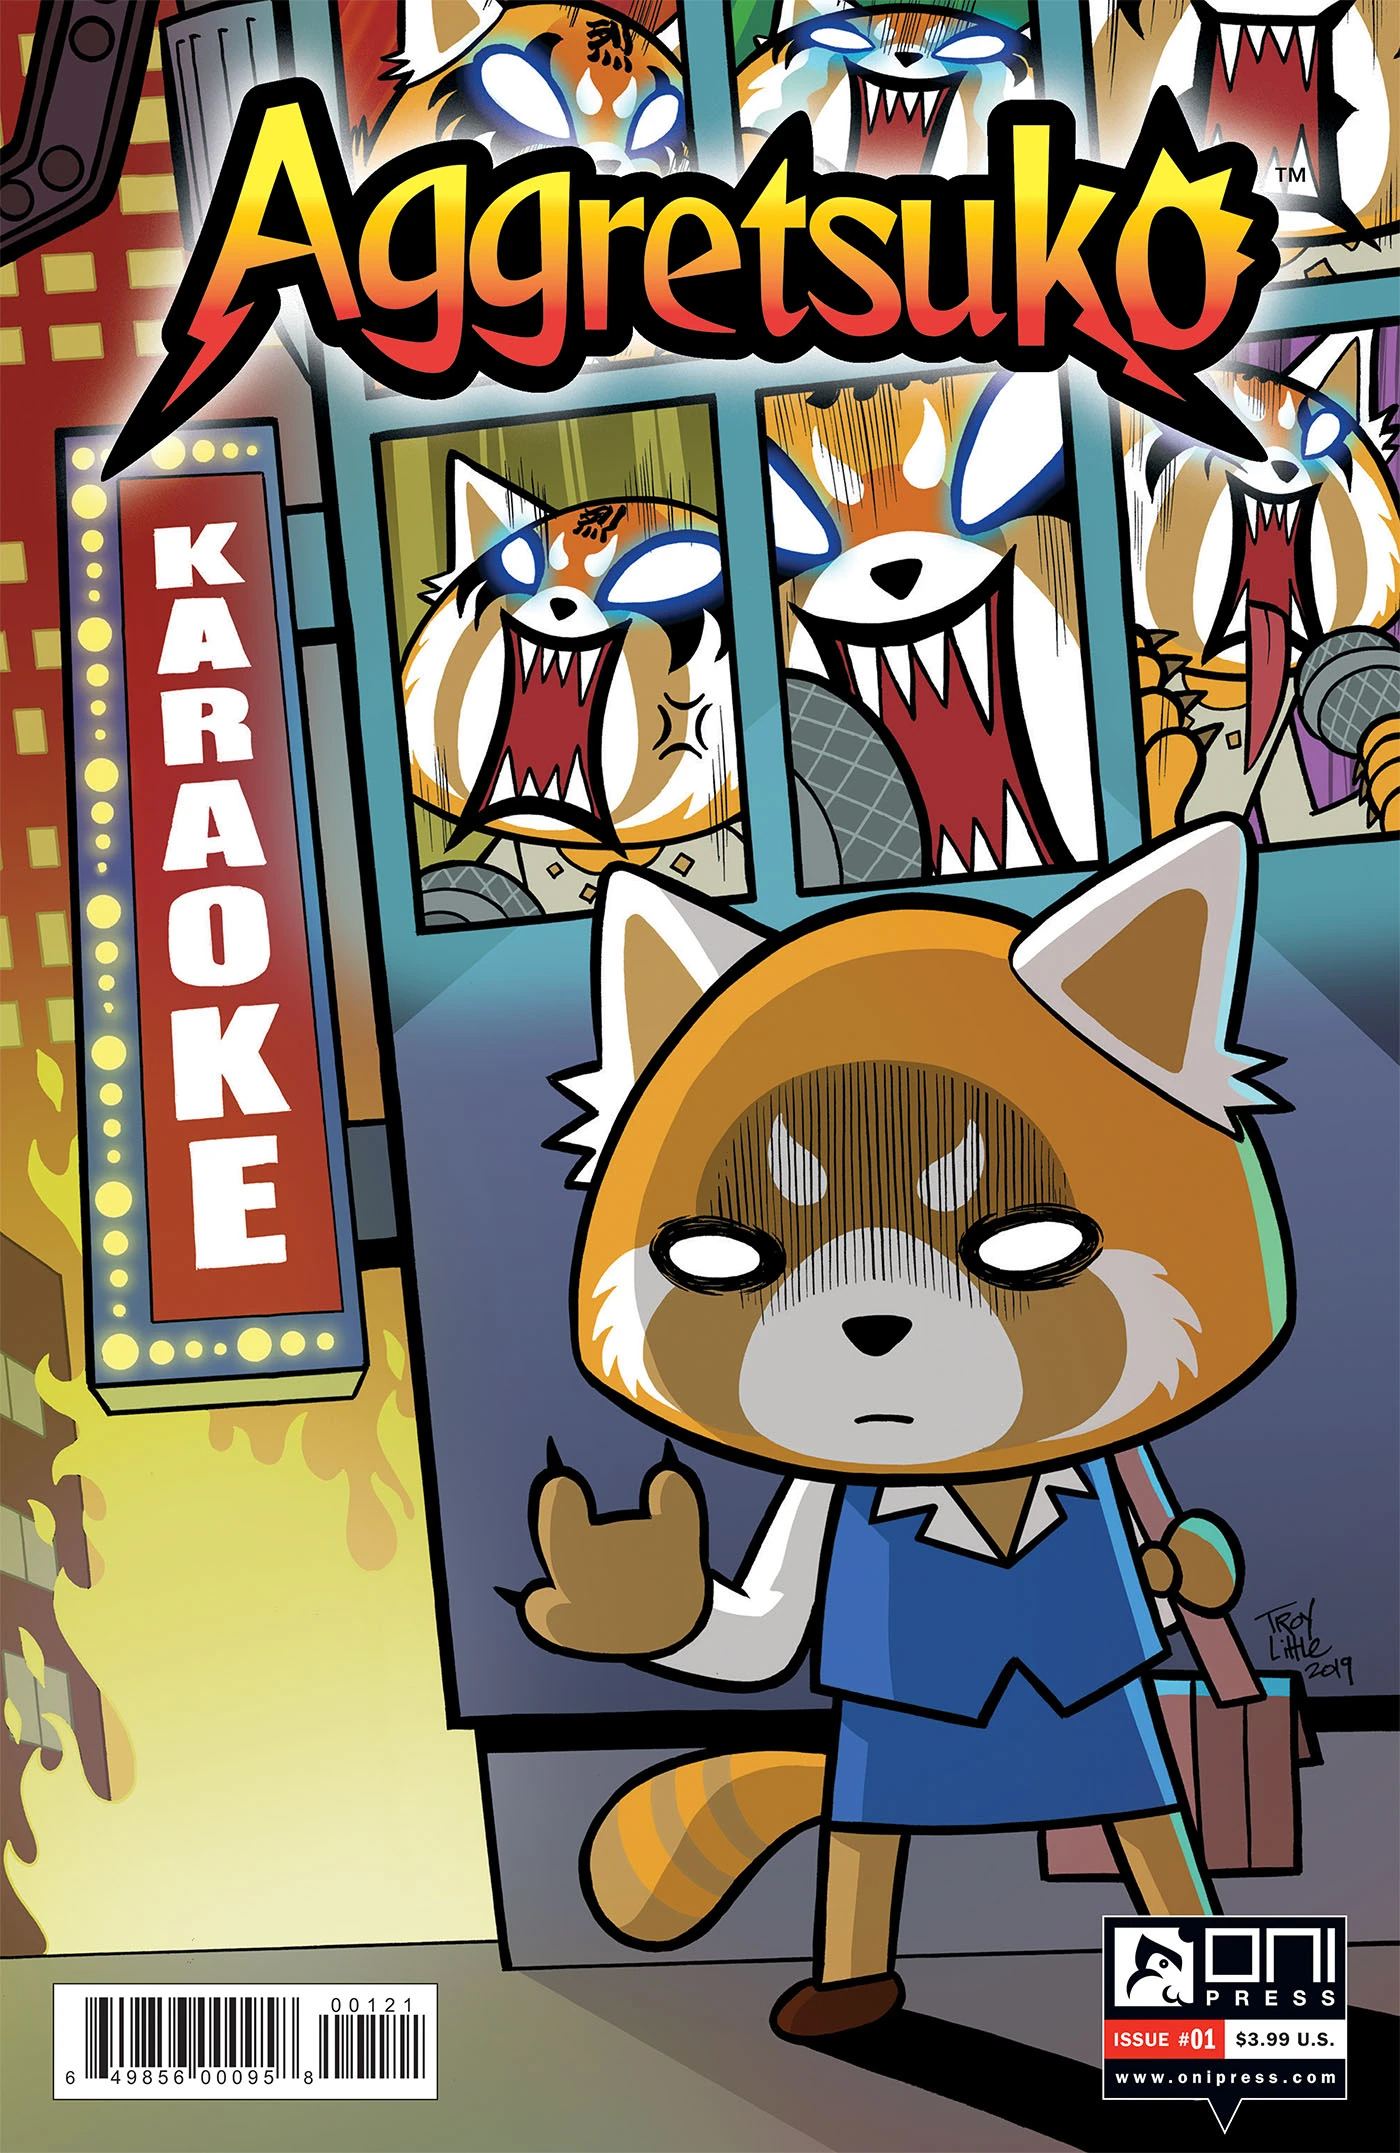 Aggretsuko Comic Issue1 CoverB.jpg